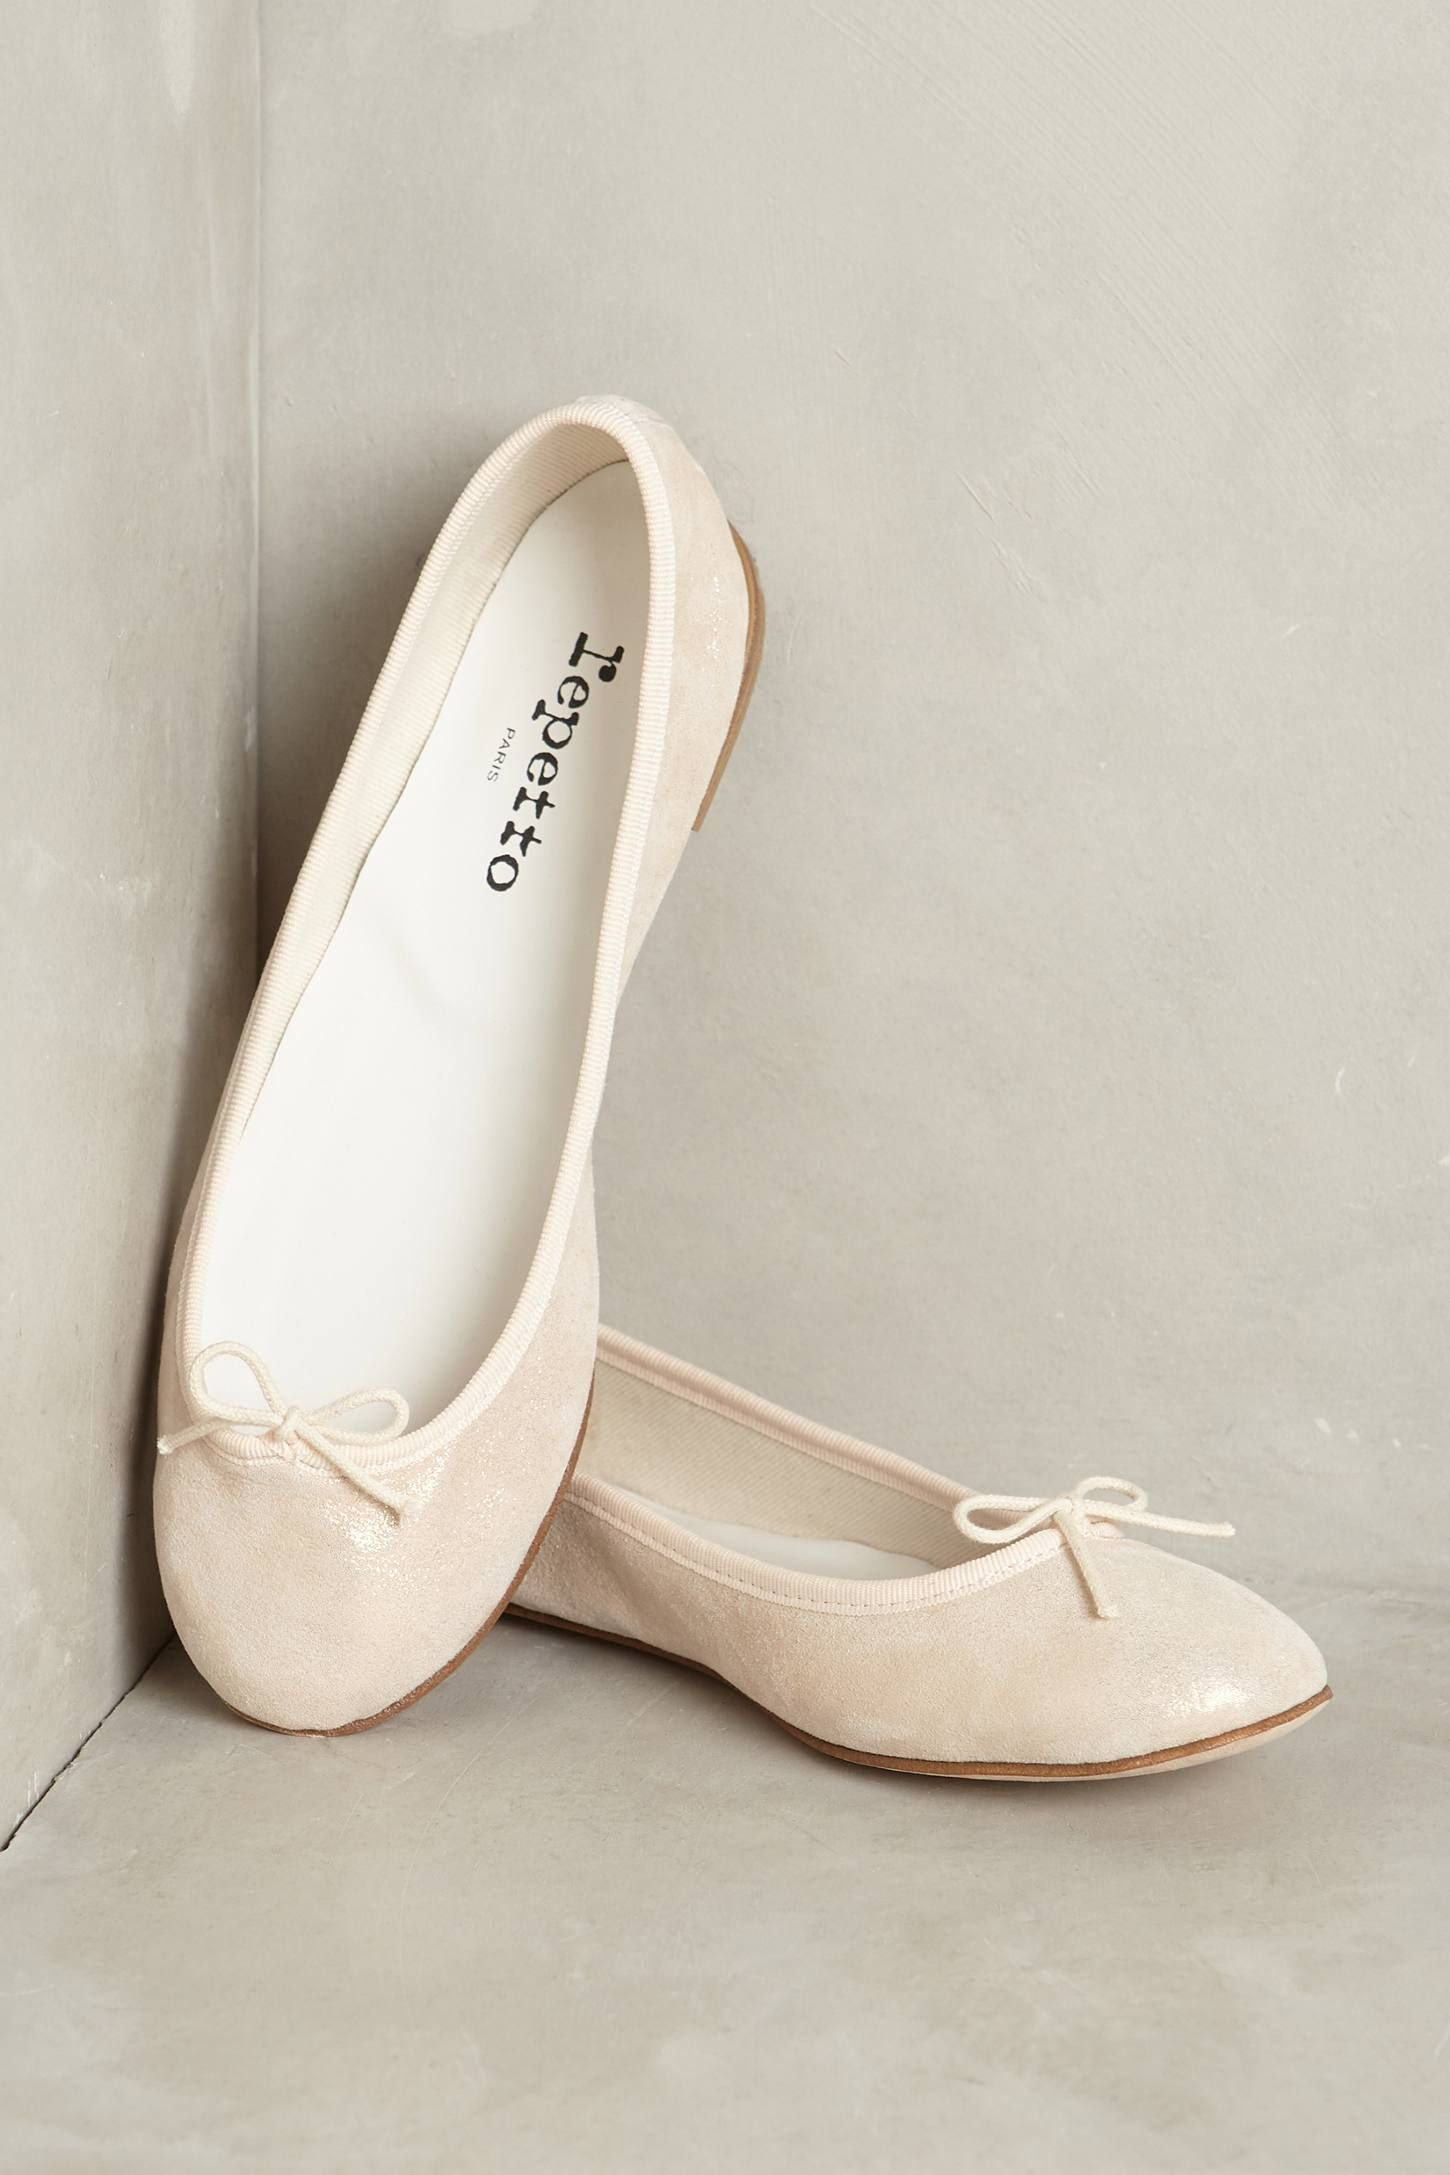 b9c148a0380 Slide View: 1: Repetto Cendrillon Metallic Ballet Flat | shoes ...